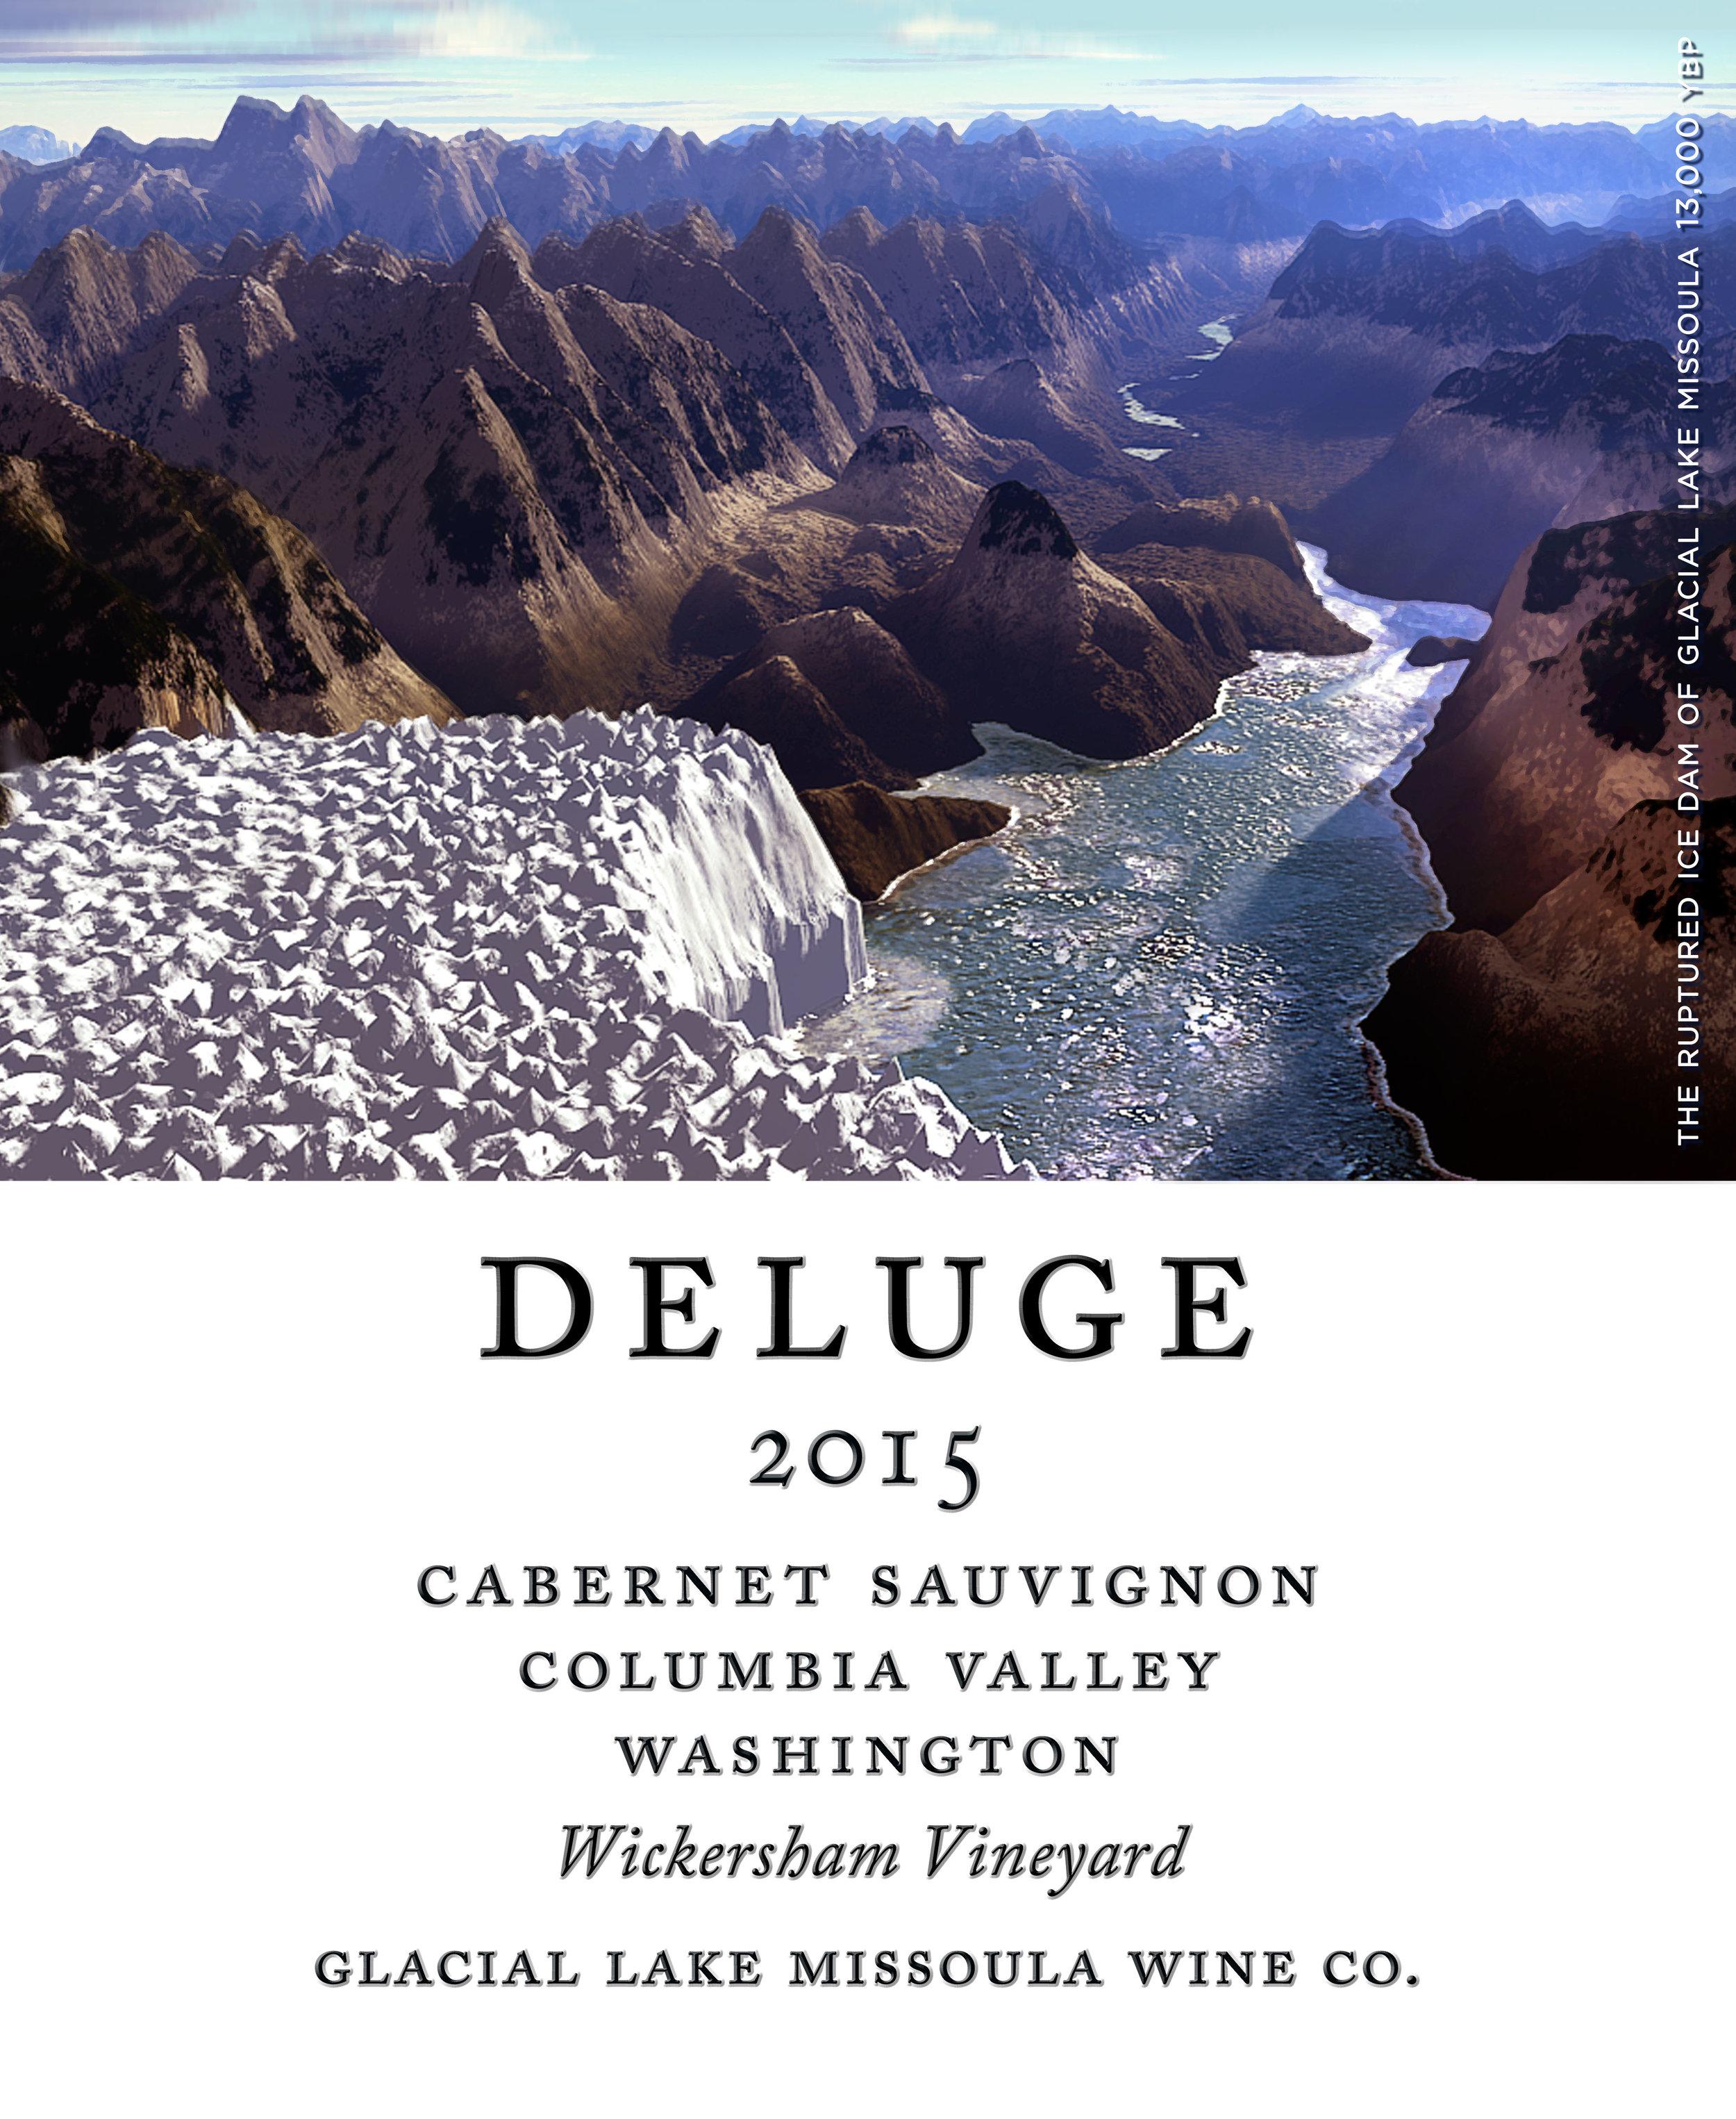 Deluge 2015